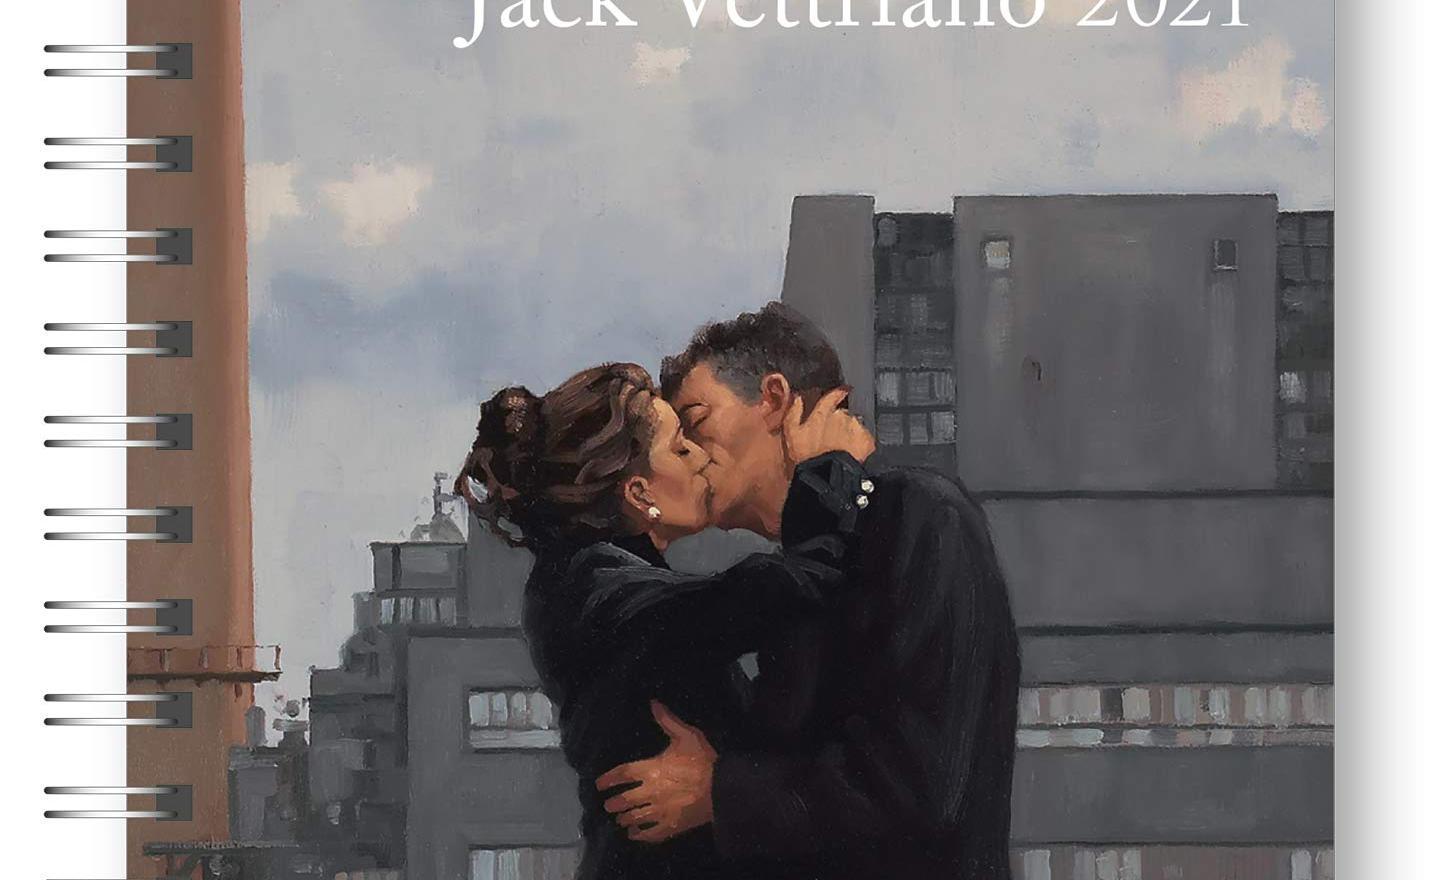 2021 Jack Vettriano Deluxe Diary